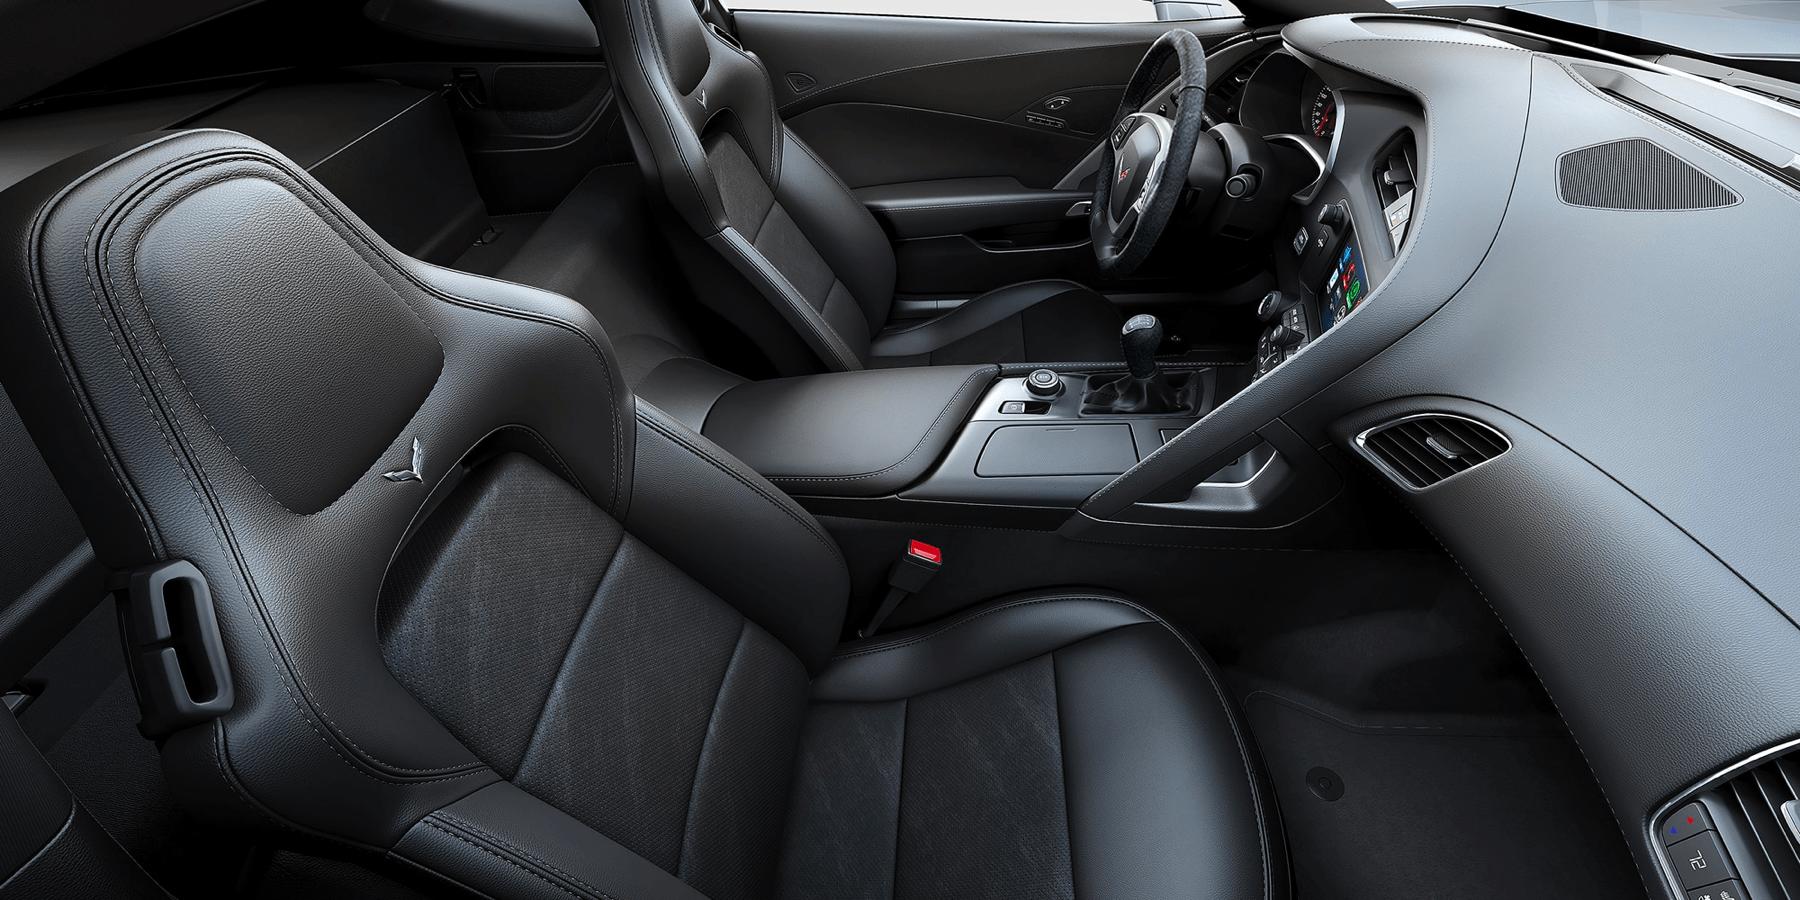 black leather Grand sport bucket seats